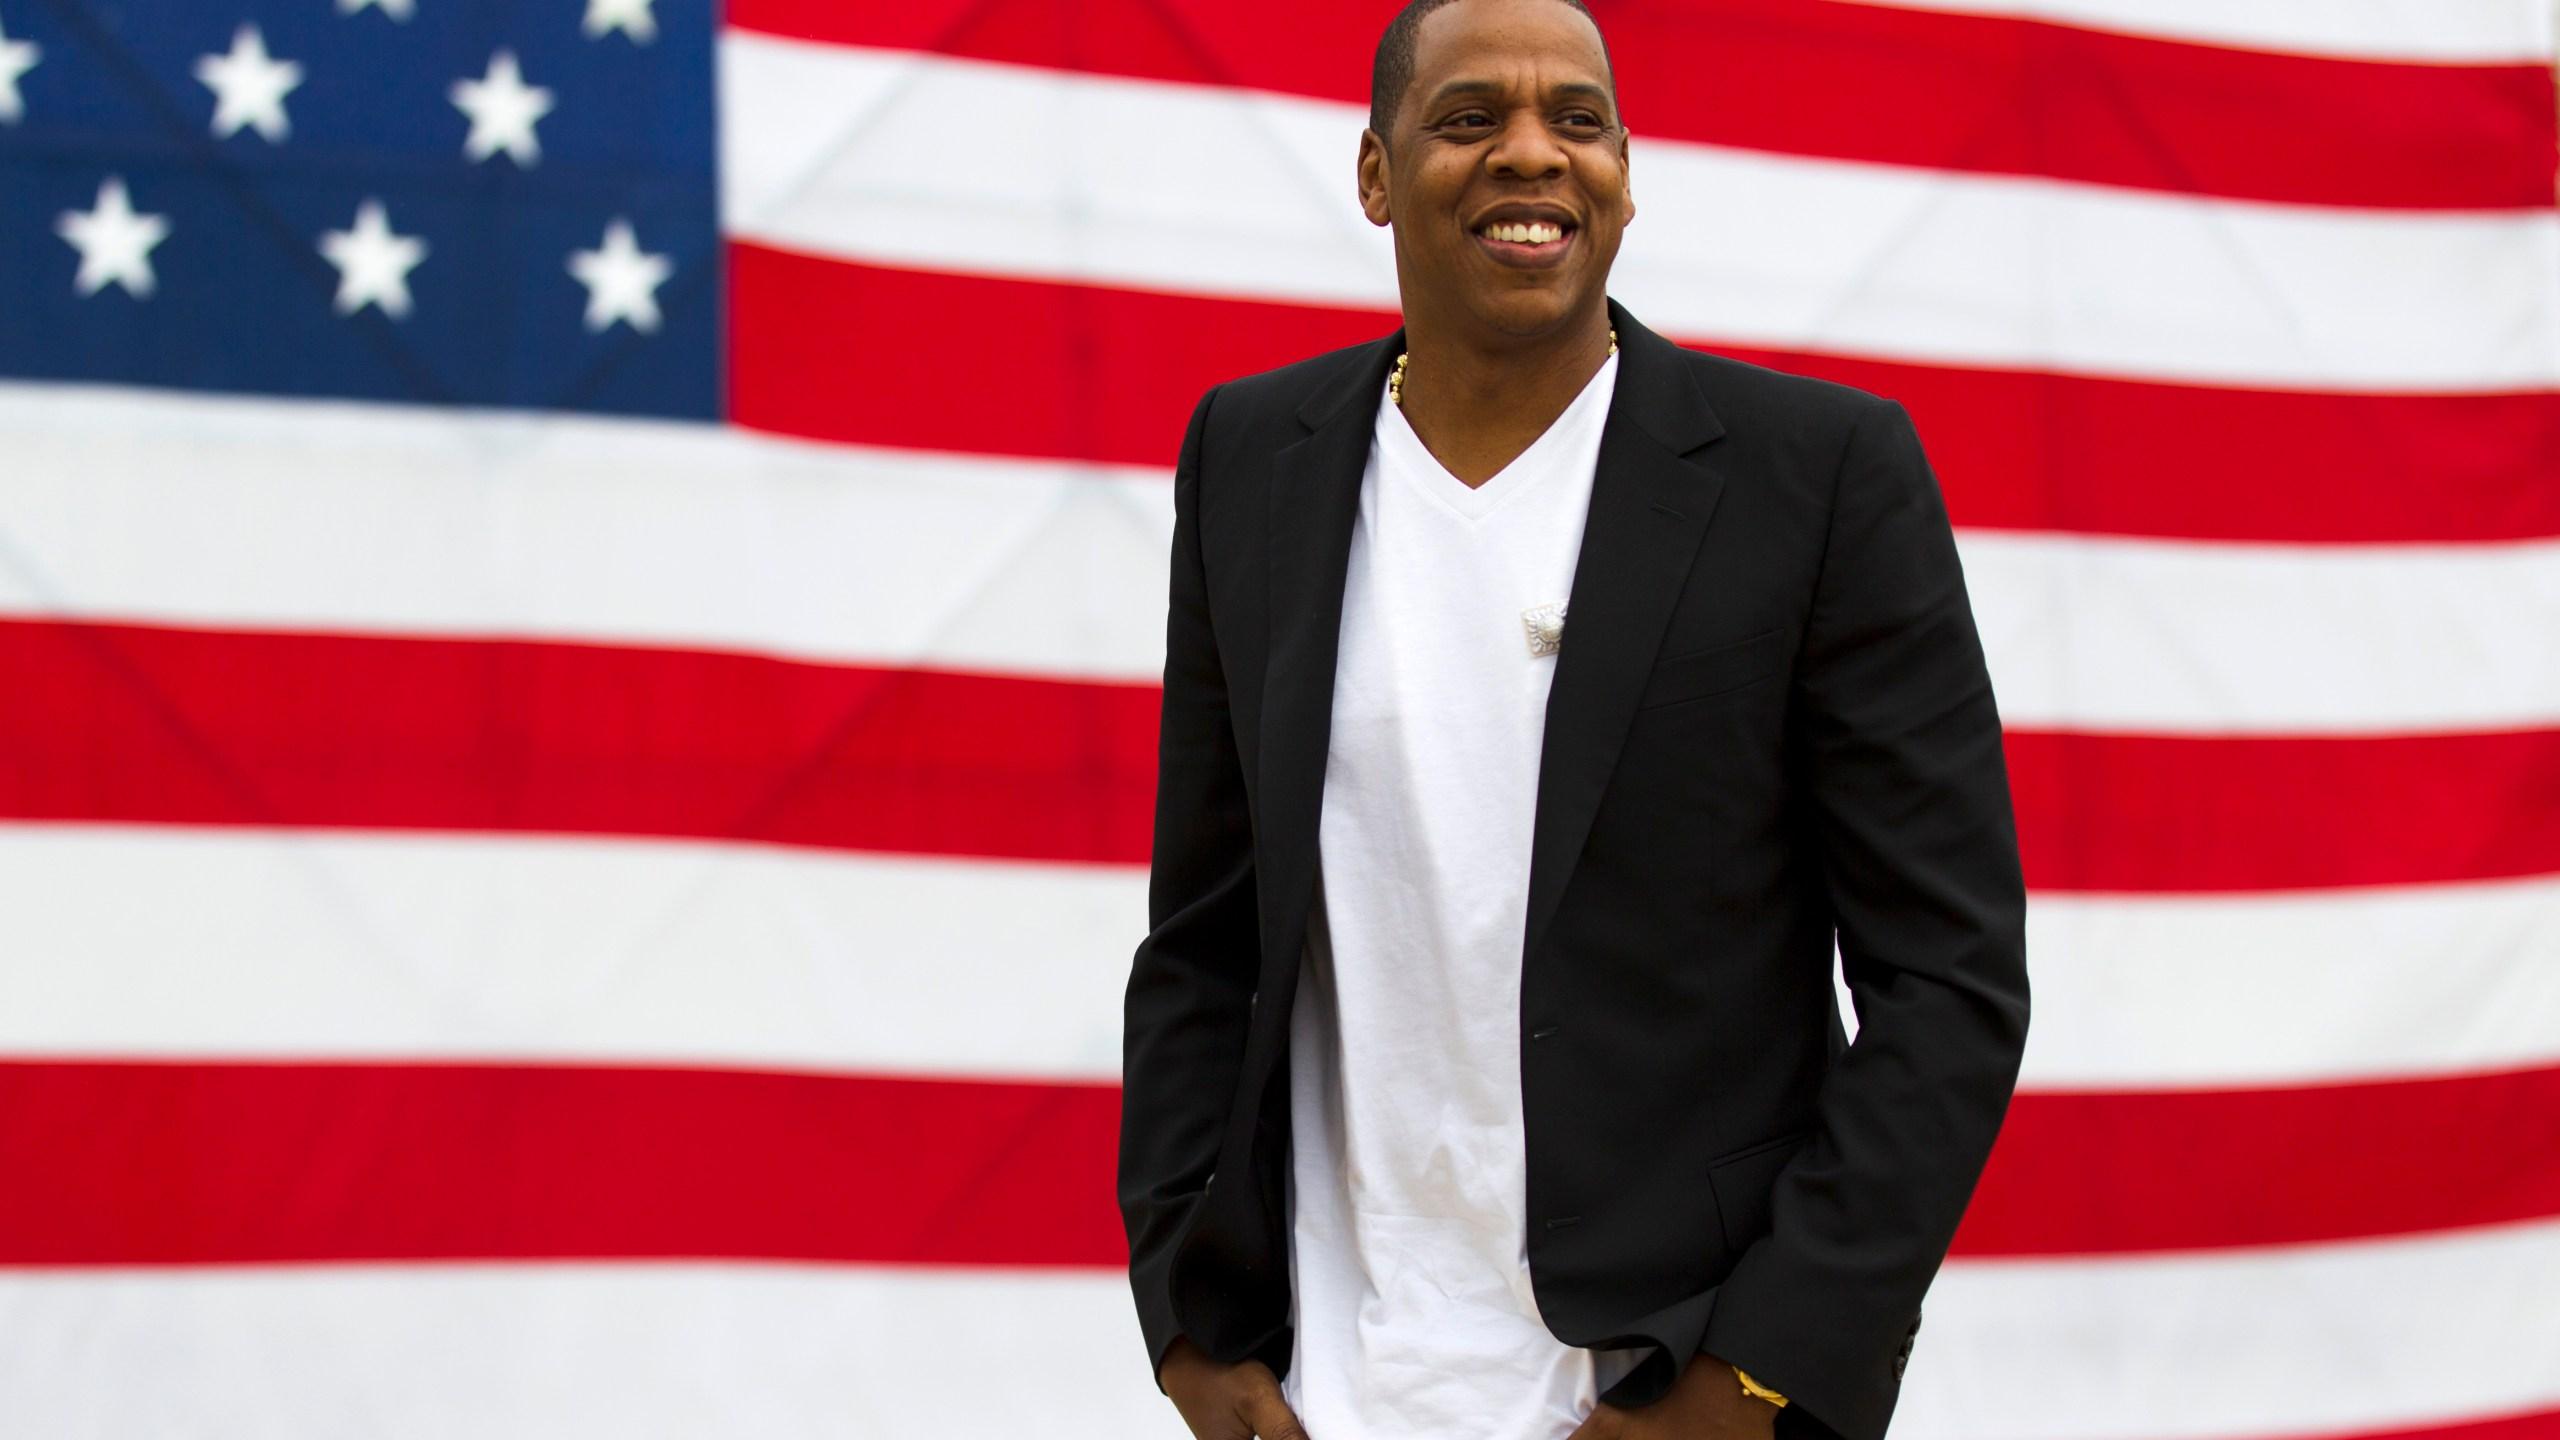 Shawn Carter, Jay-Z